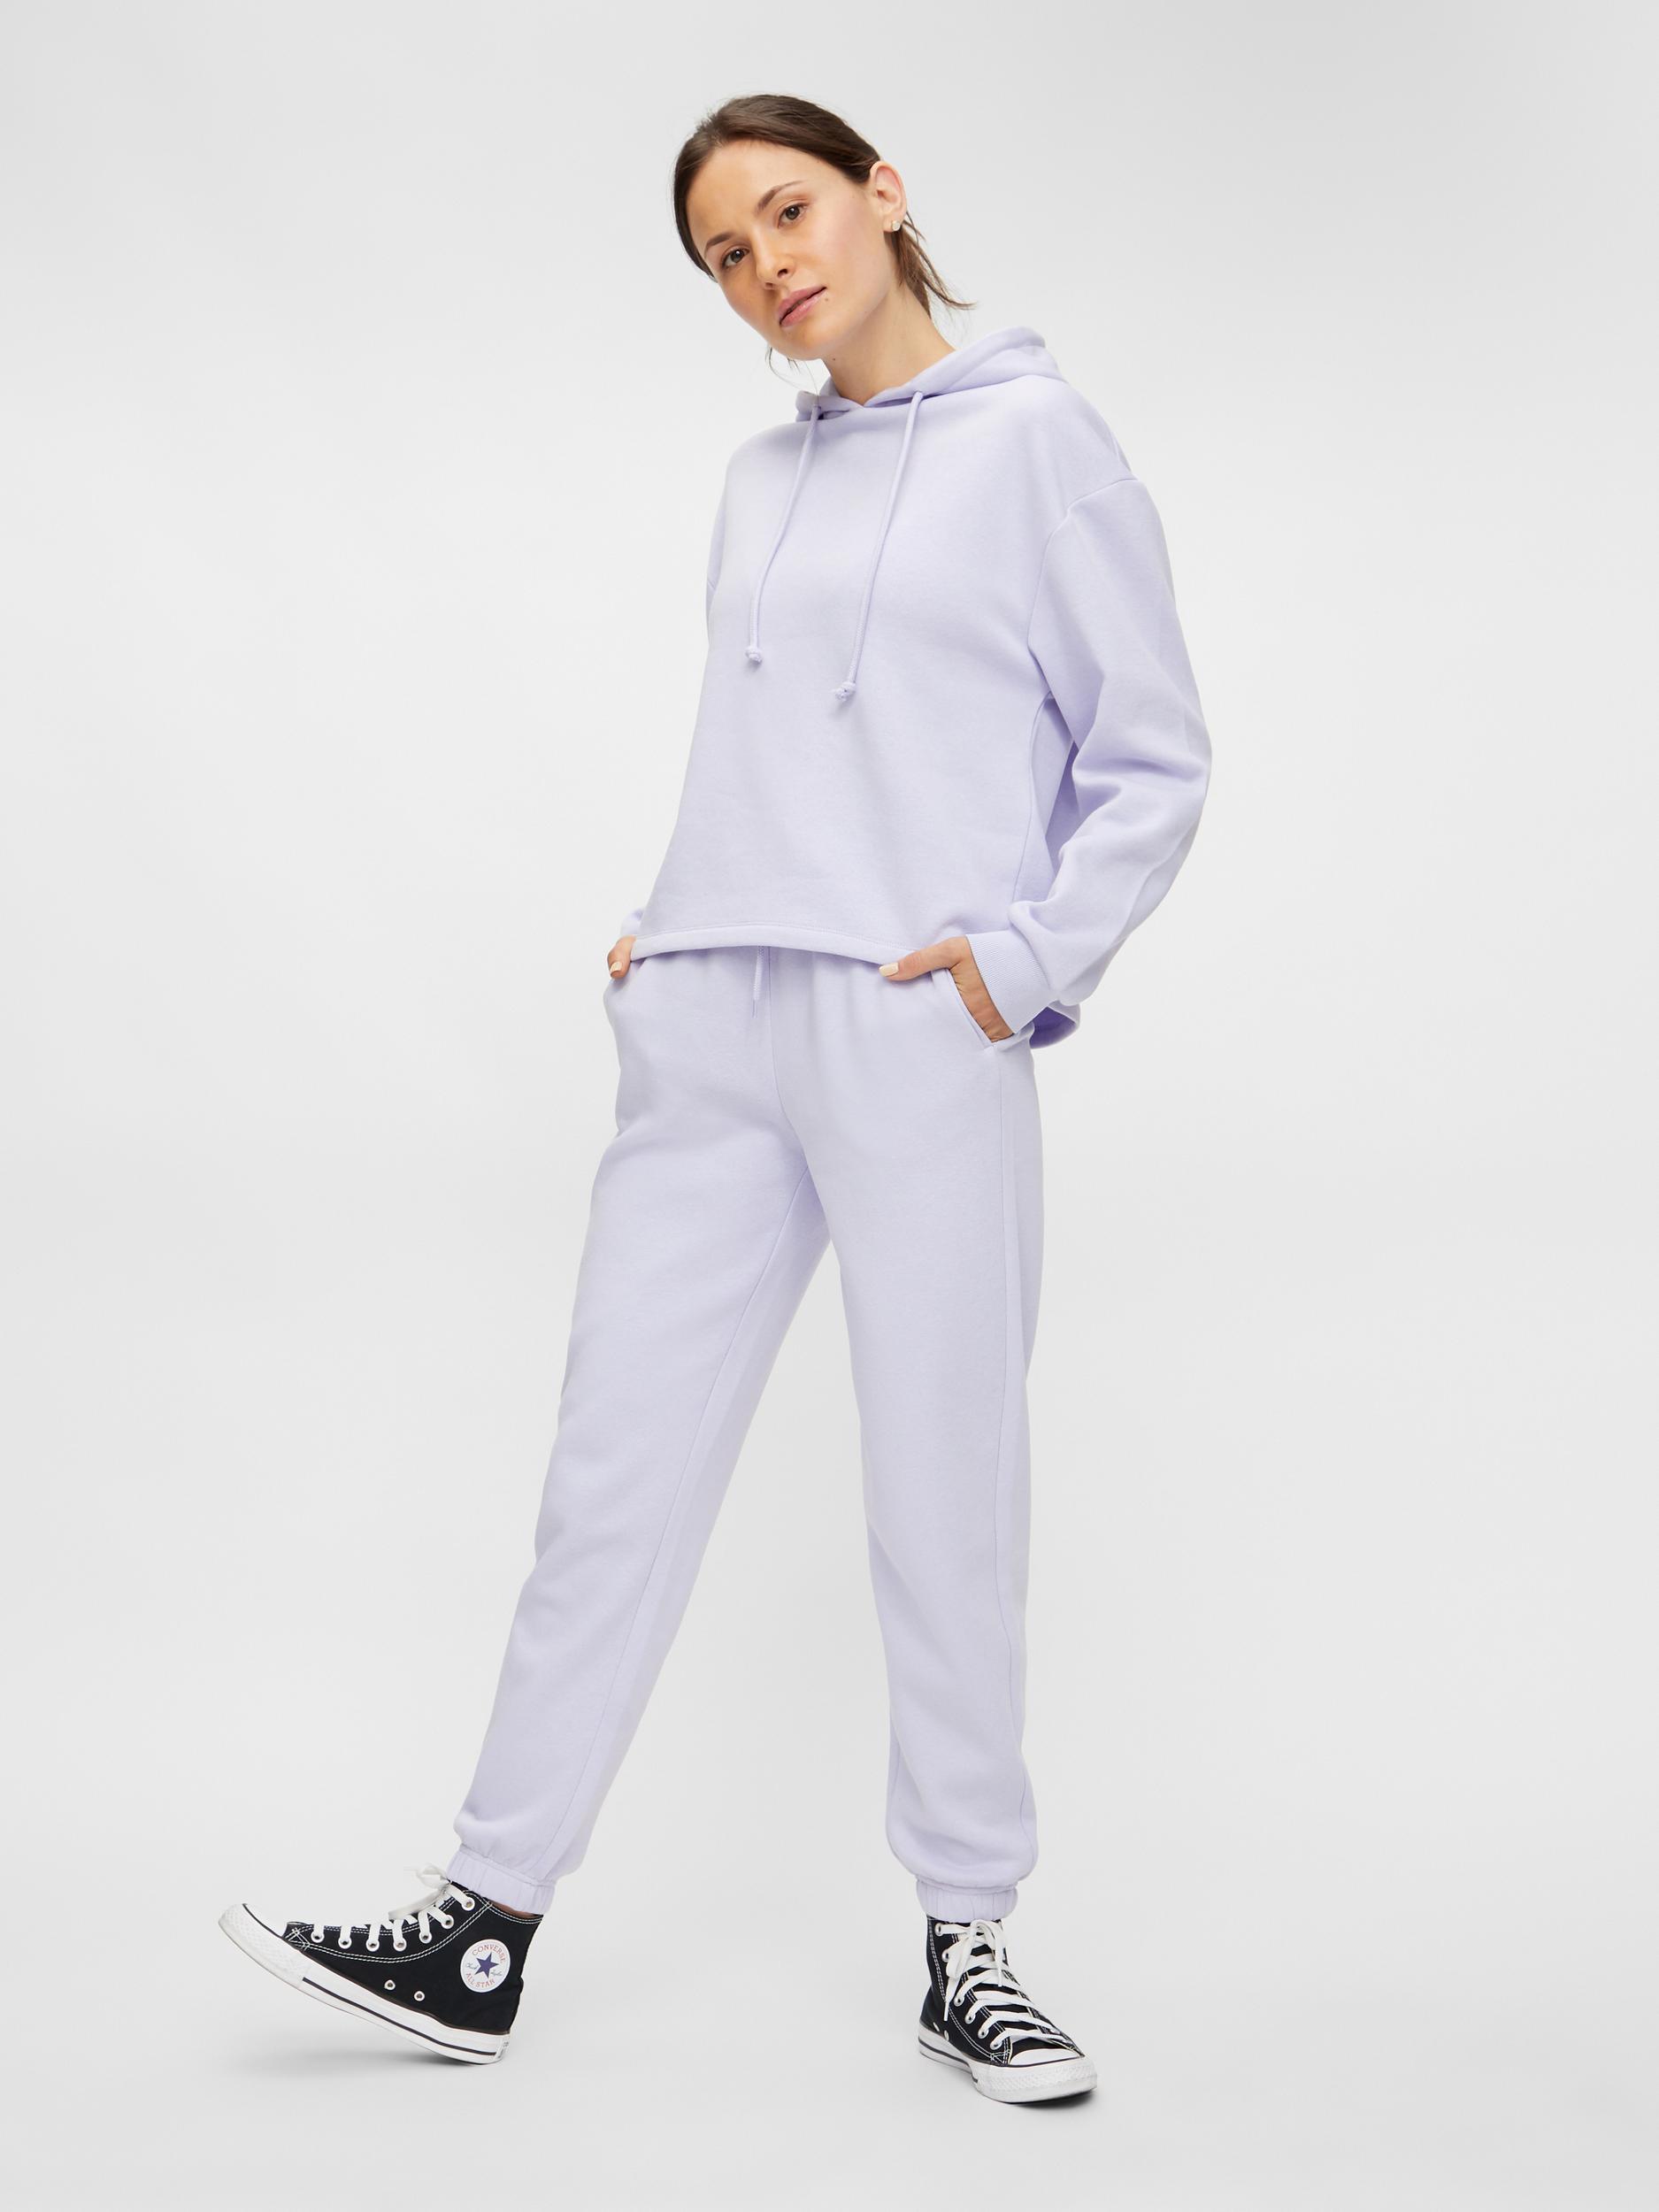 Pieces Chilli sweatpants, purple heather, medium